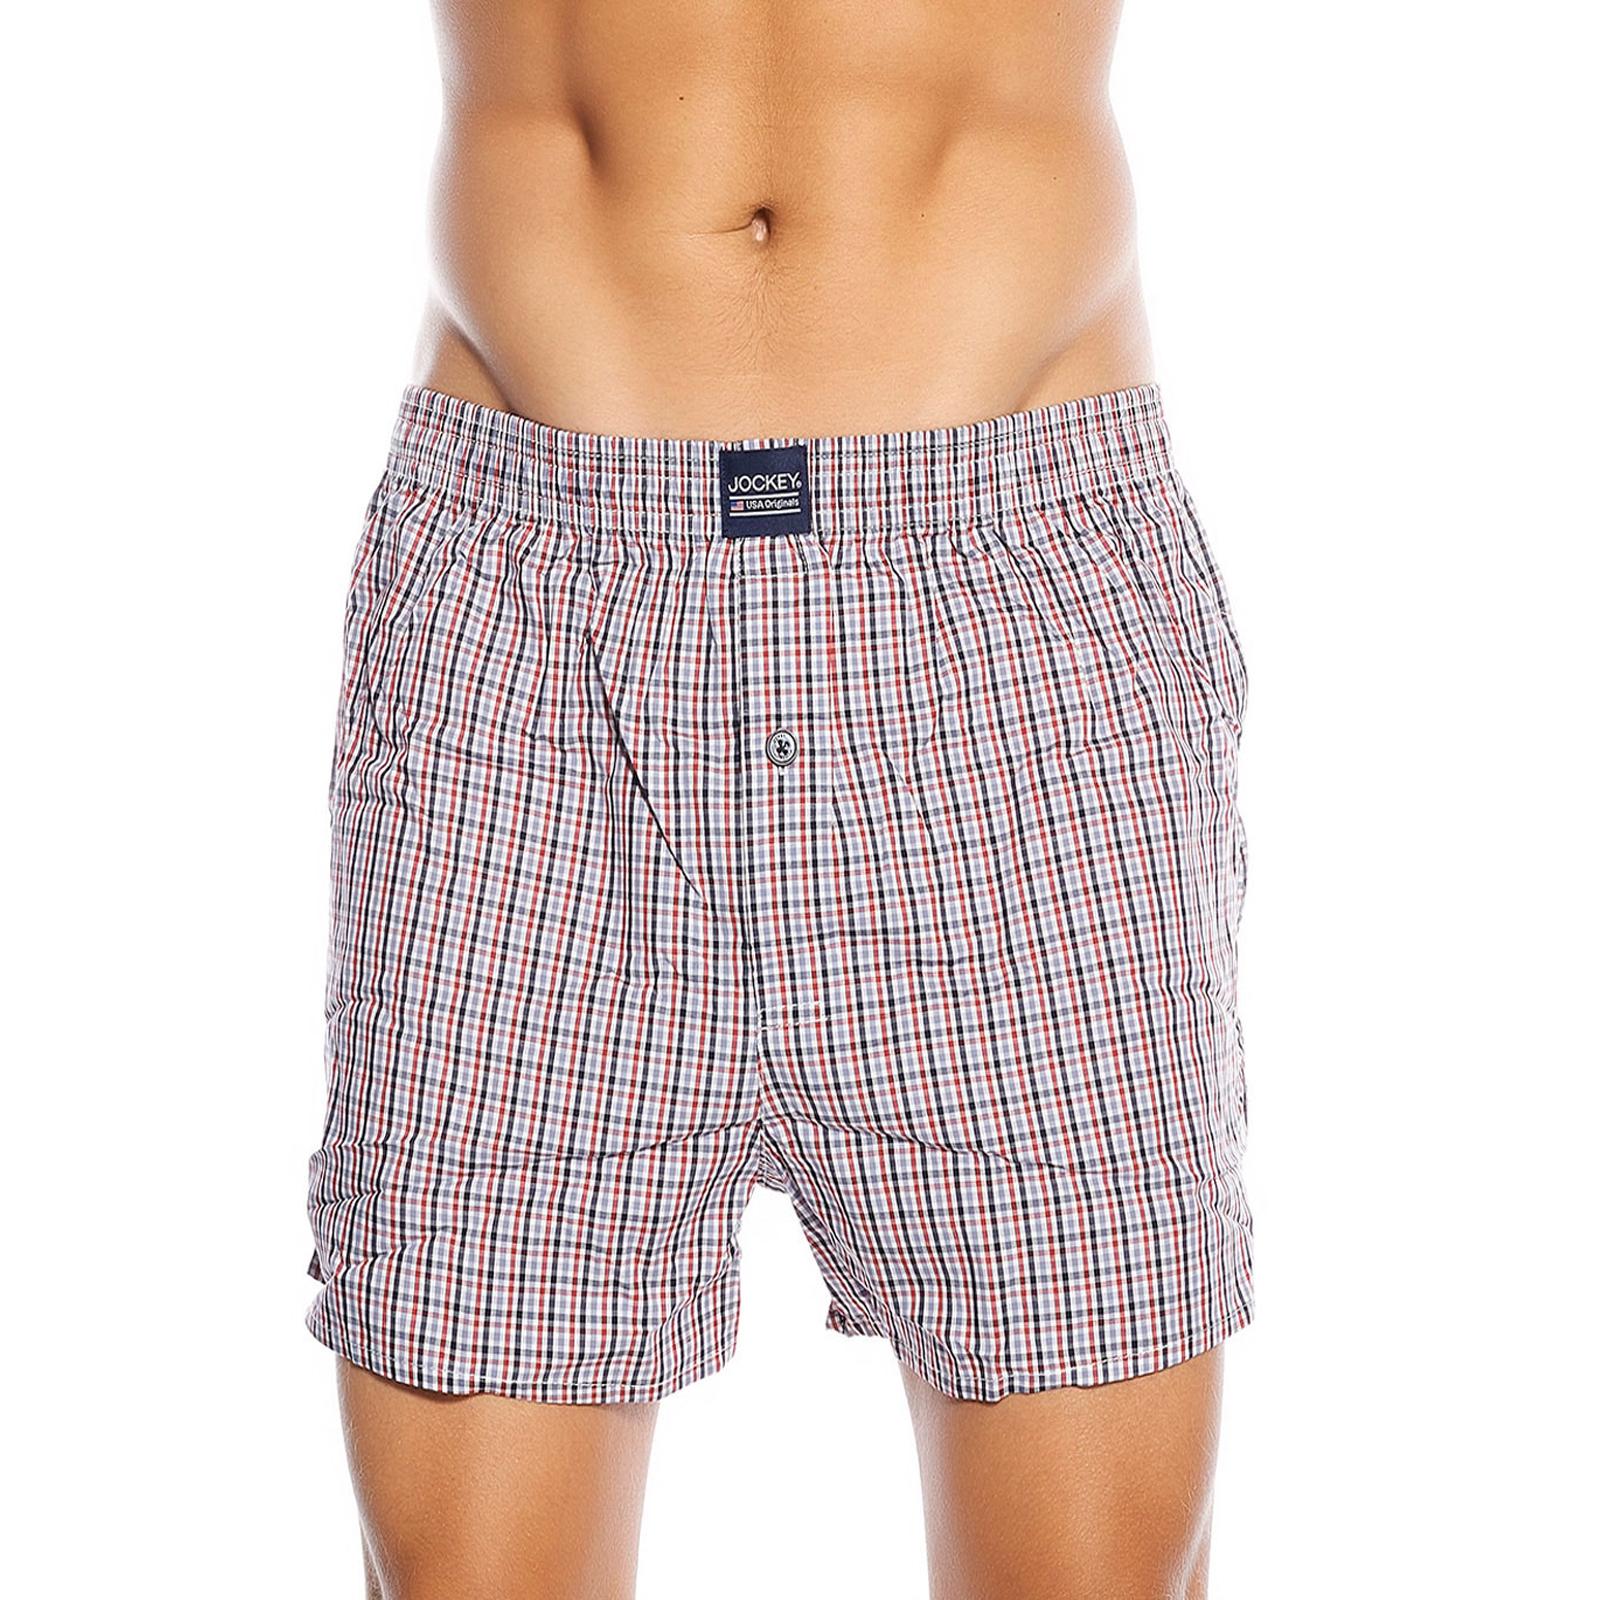 Jockey-usa-homme-lot-de-2-boxer-shorts-big-tall-king-taille-reguliere-en-rouge-bleu-marine